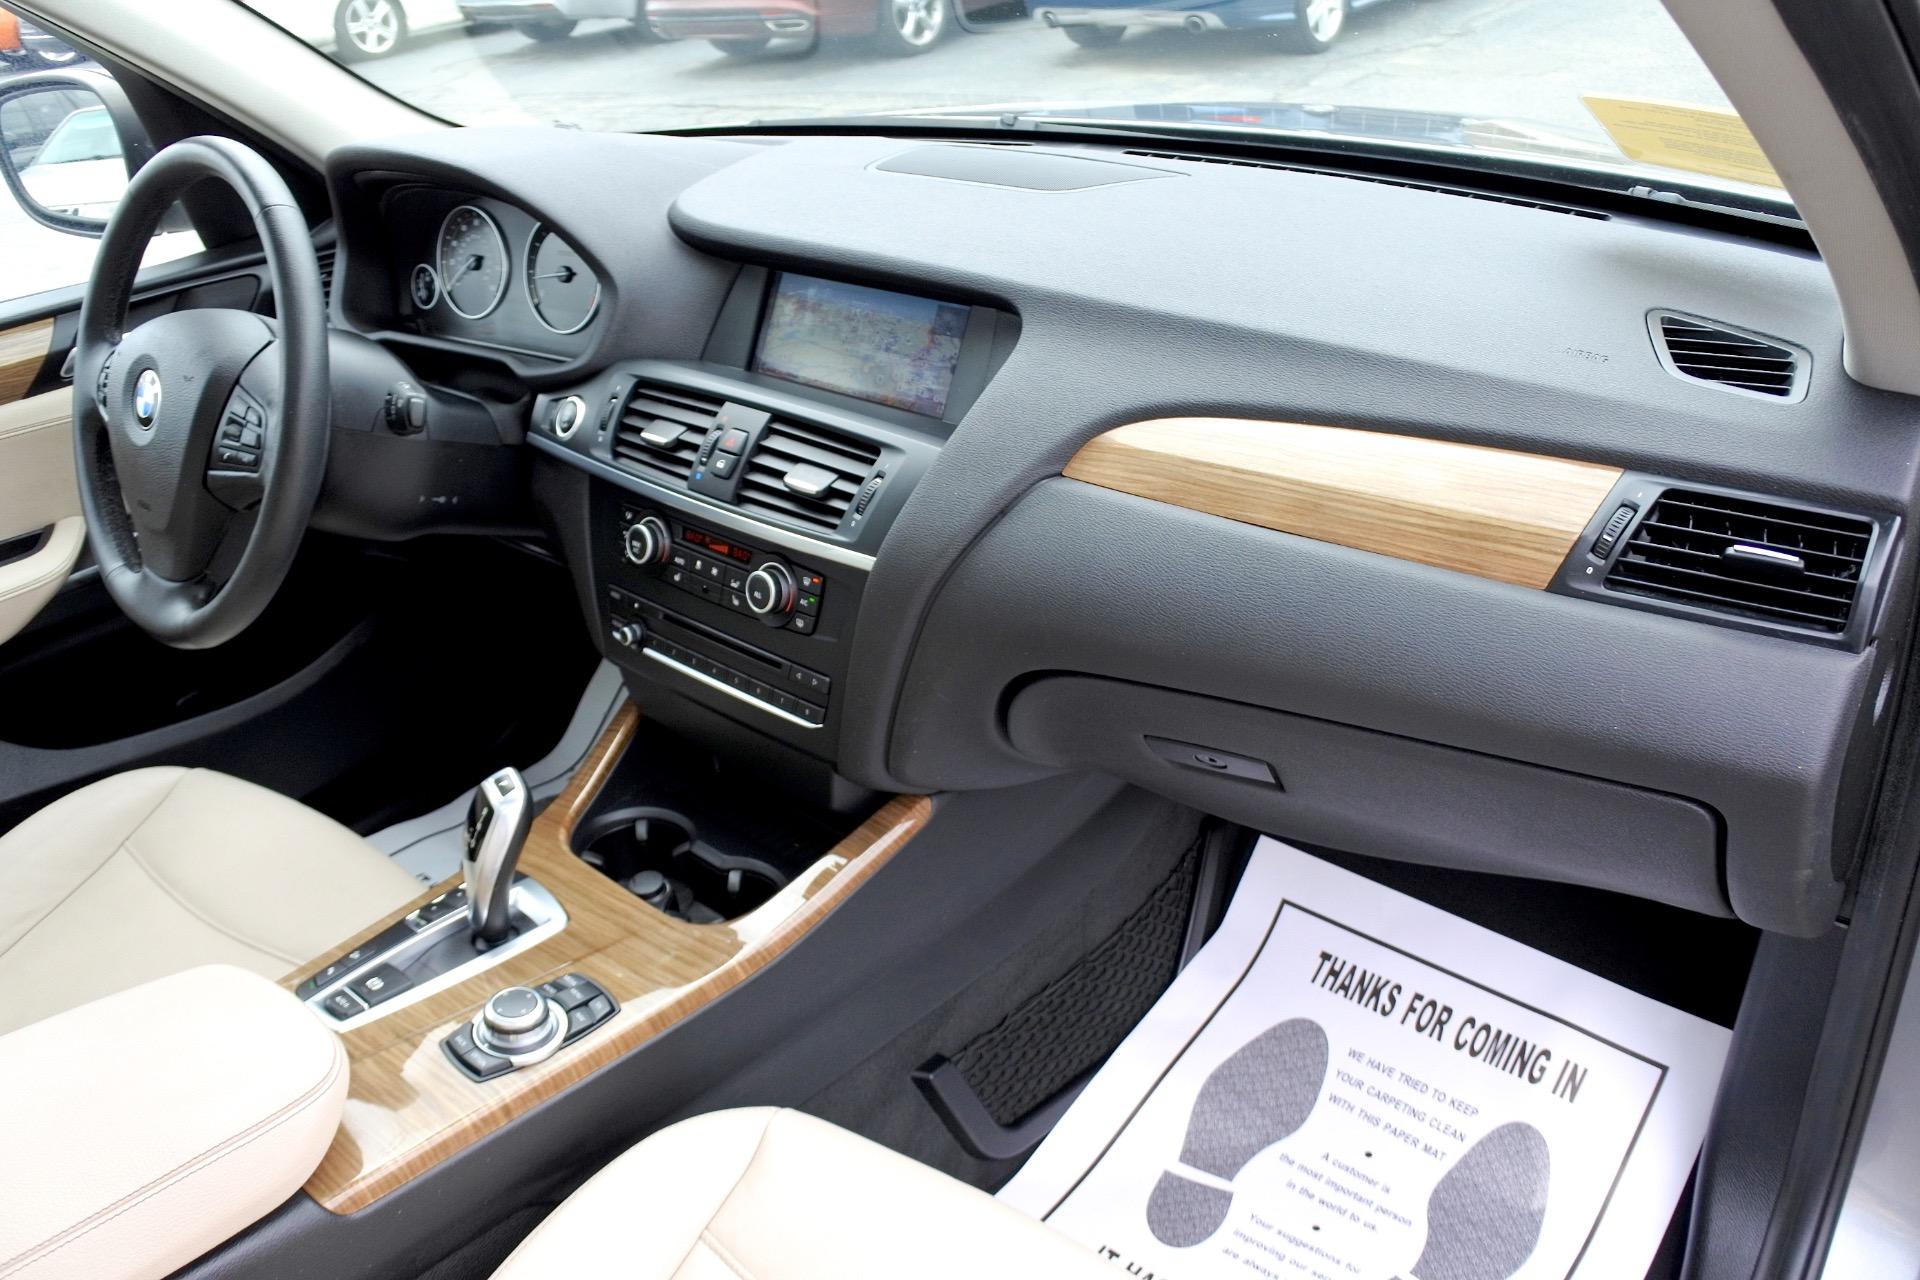 Used 2013 BMW X3 xDrive28i AWD Used 2013 BMW X3 xDrive28i AWD for sale  at Metro West Motorcars LLC in Shrewsbury MA 20